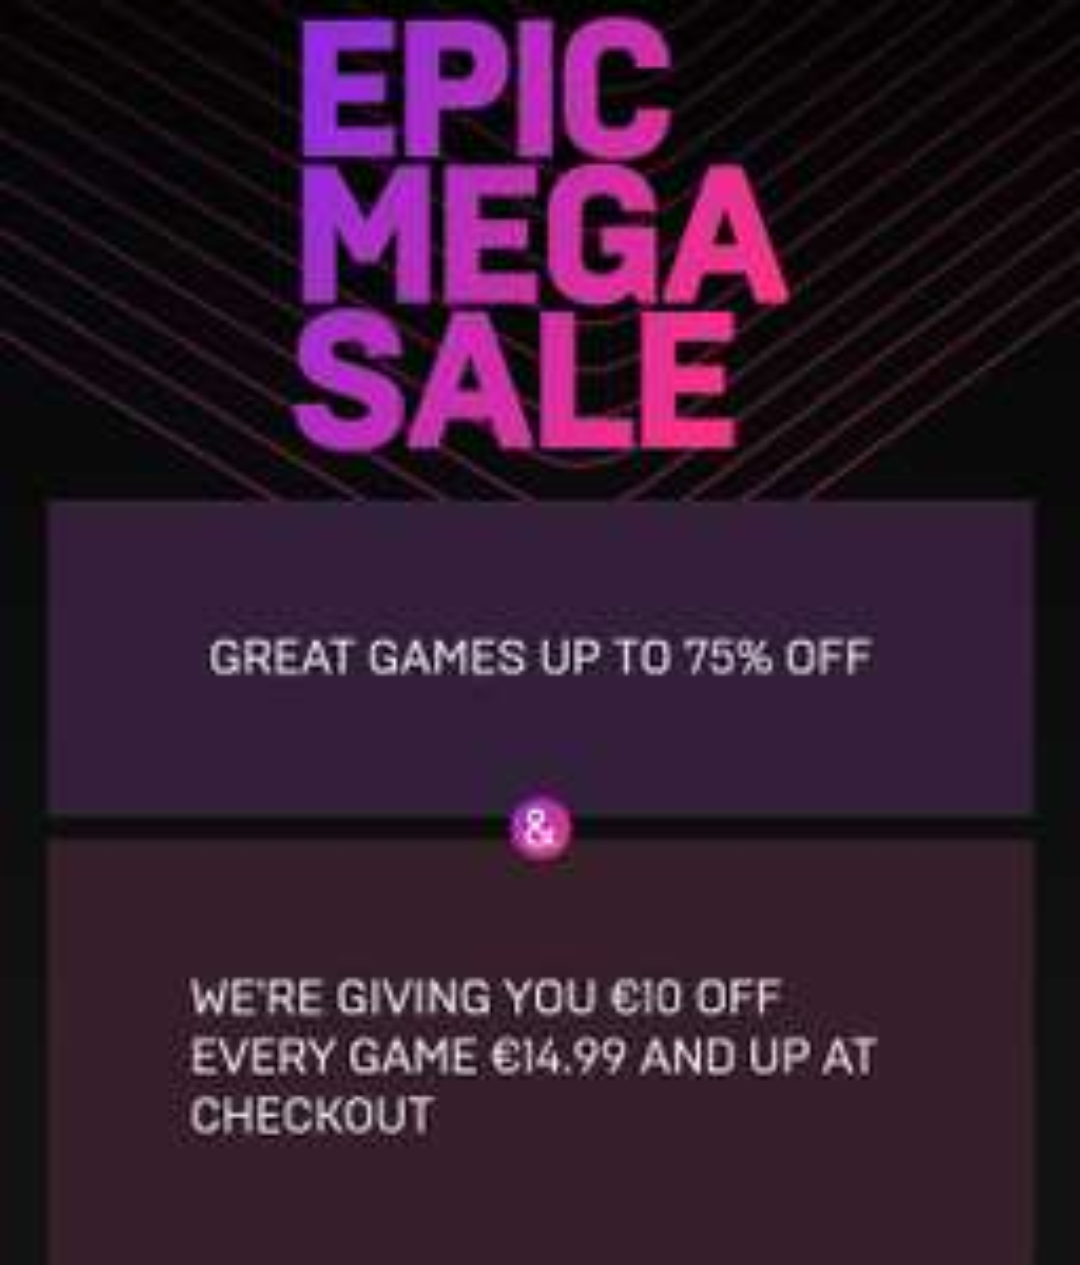 Epic Mega Sale tot -75% +€10 tegoed +Cashback op aankopen tussen 2 en 15 mei  @ Epic Games Store